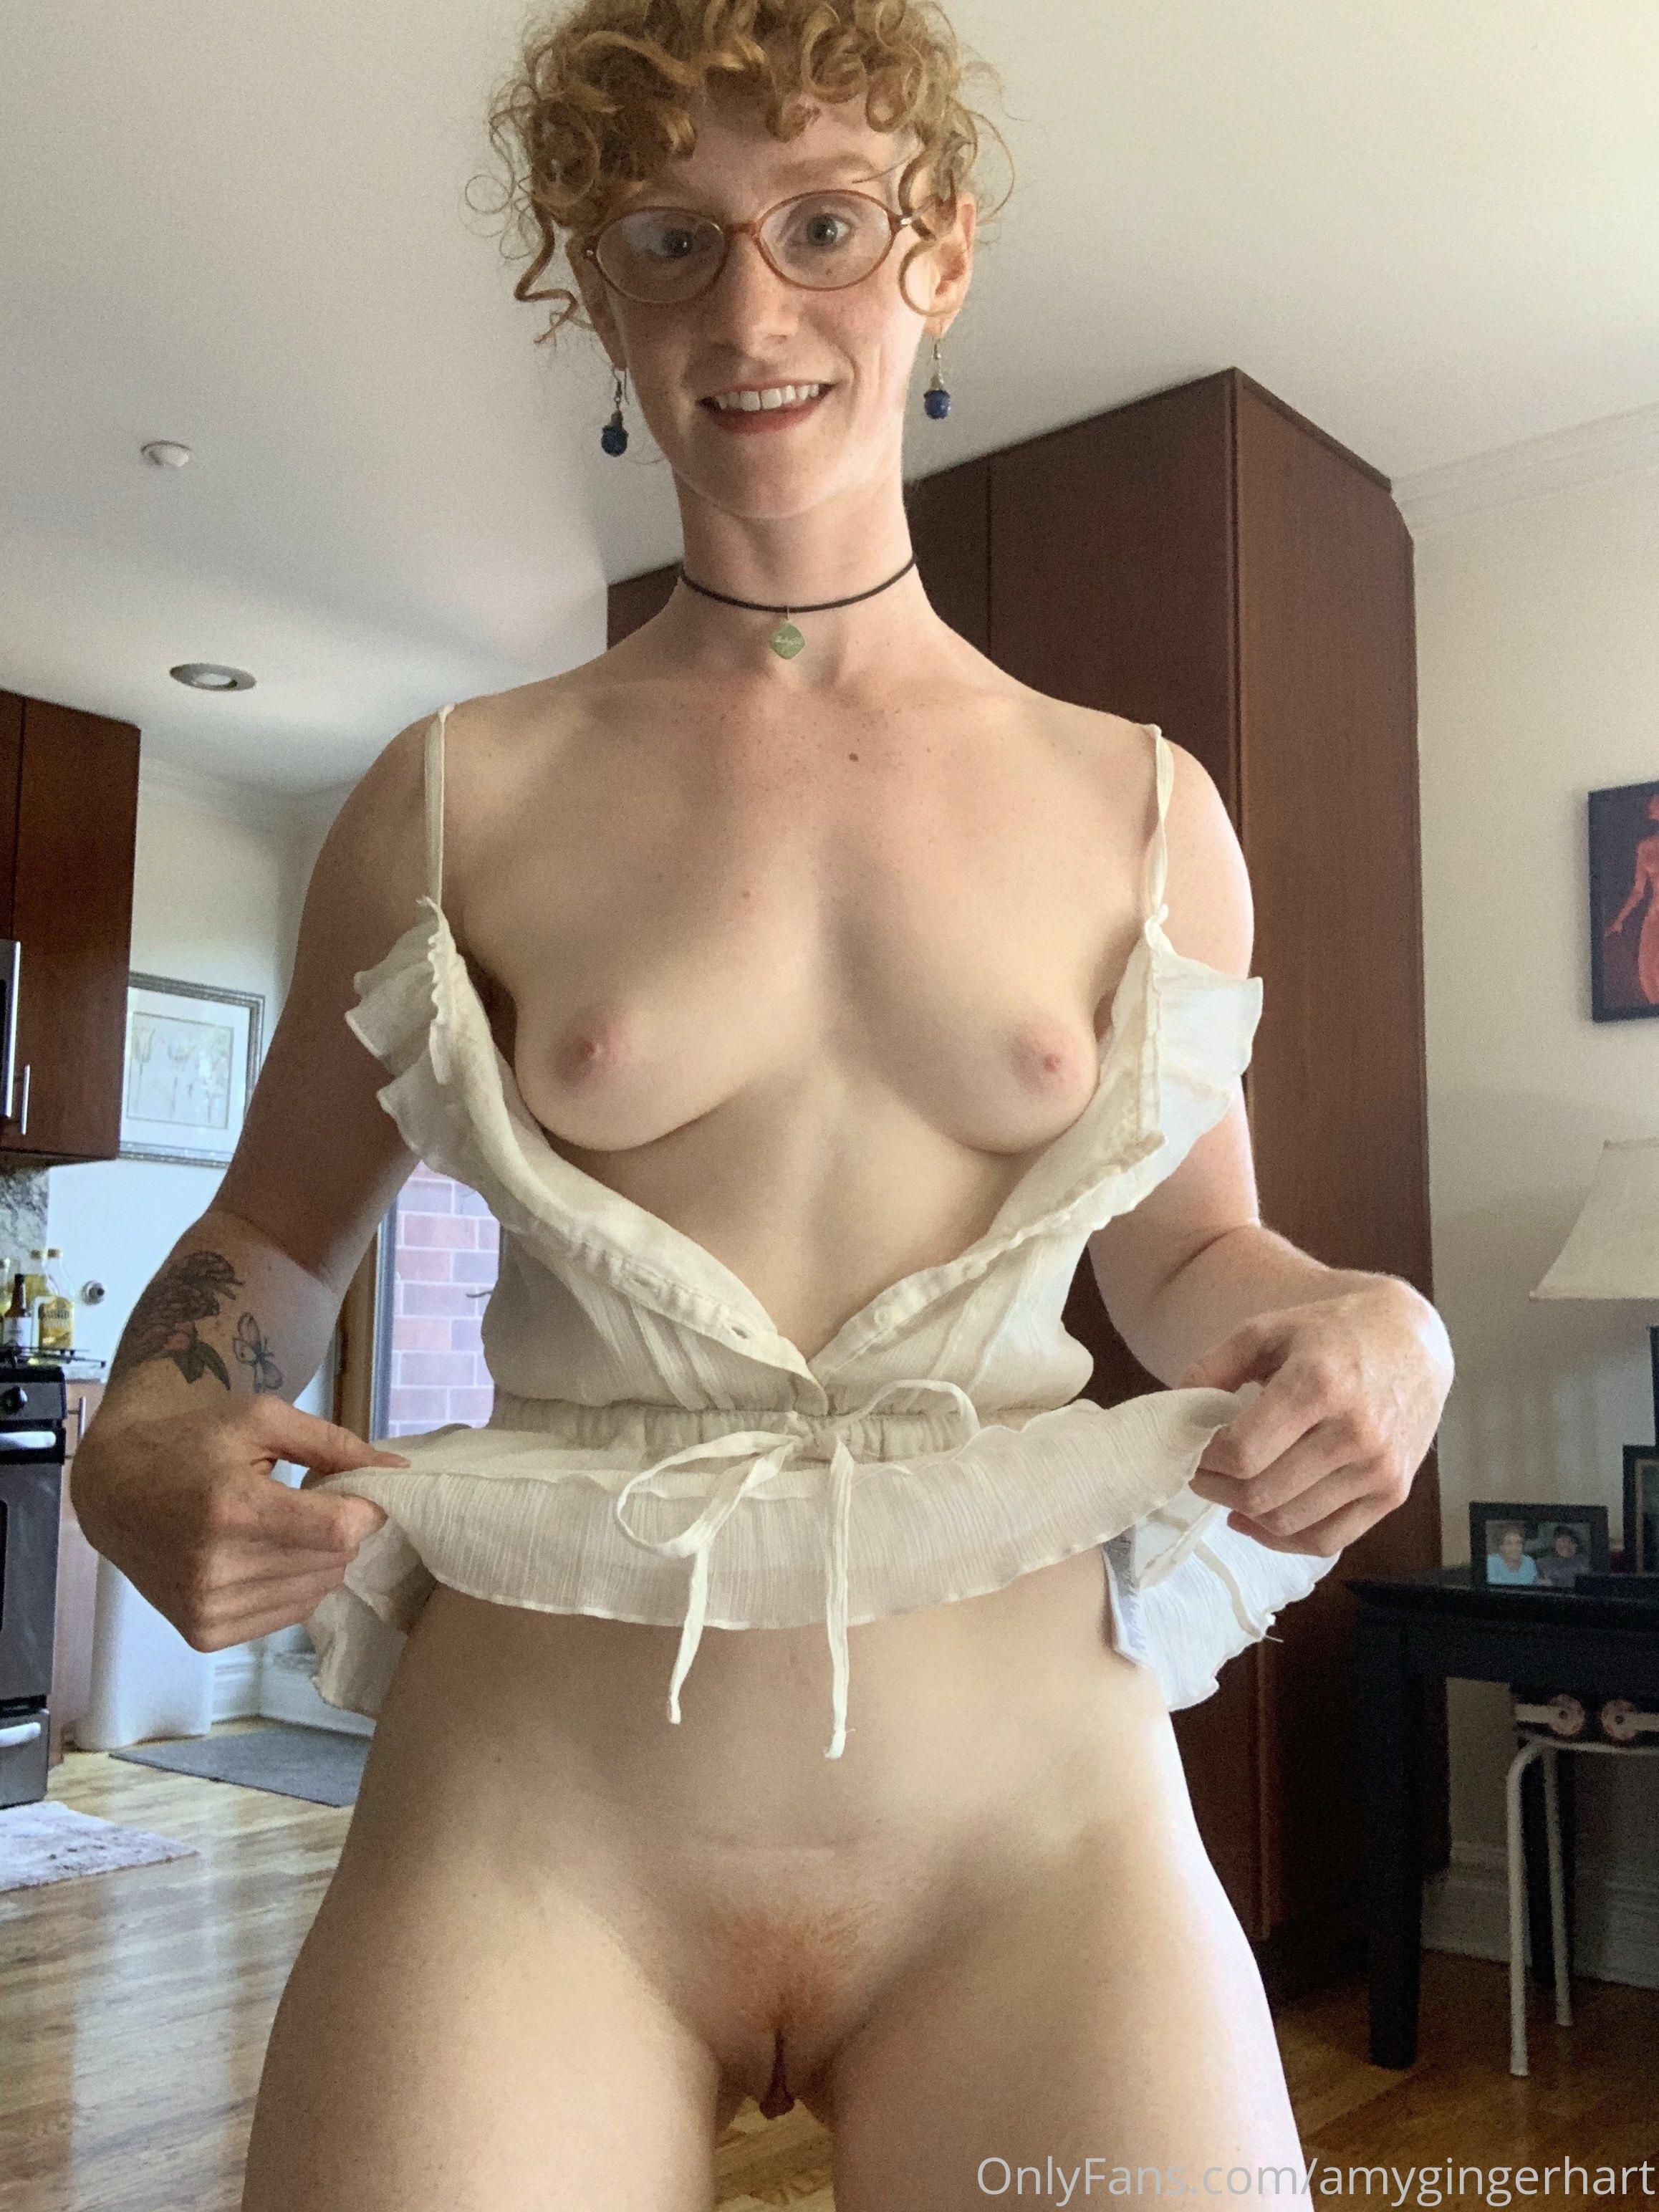 Amy Hart, Amygingerhart, Onlyfans 0037